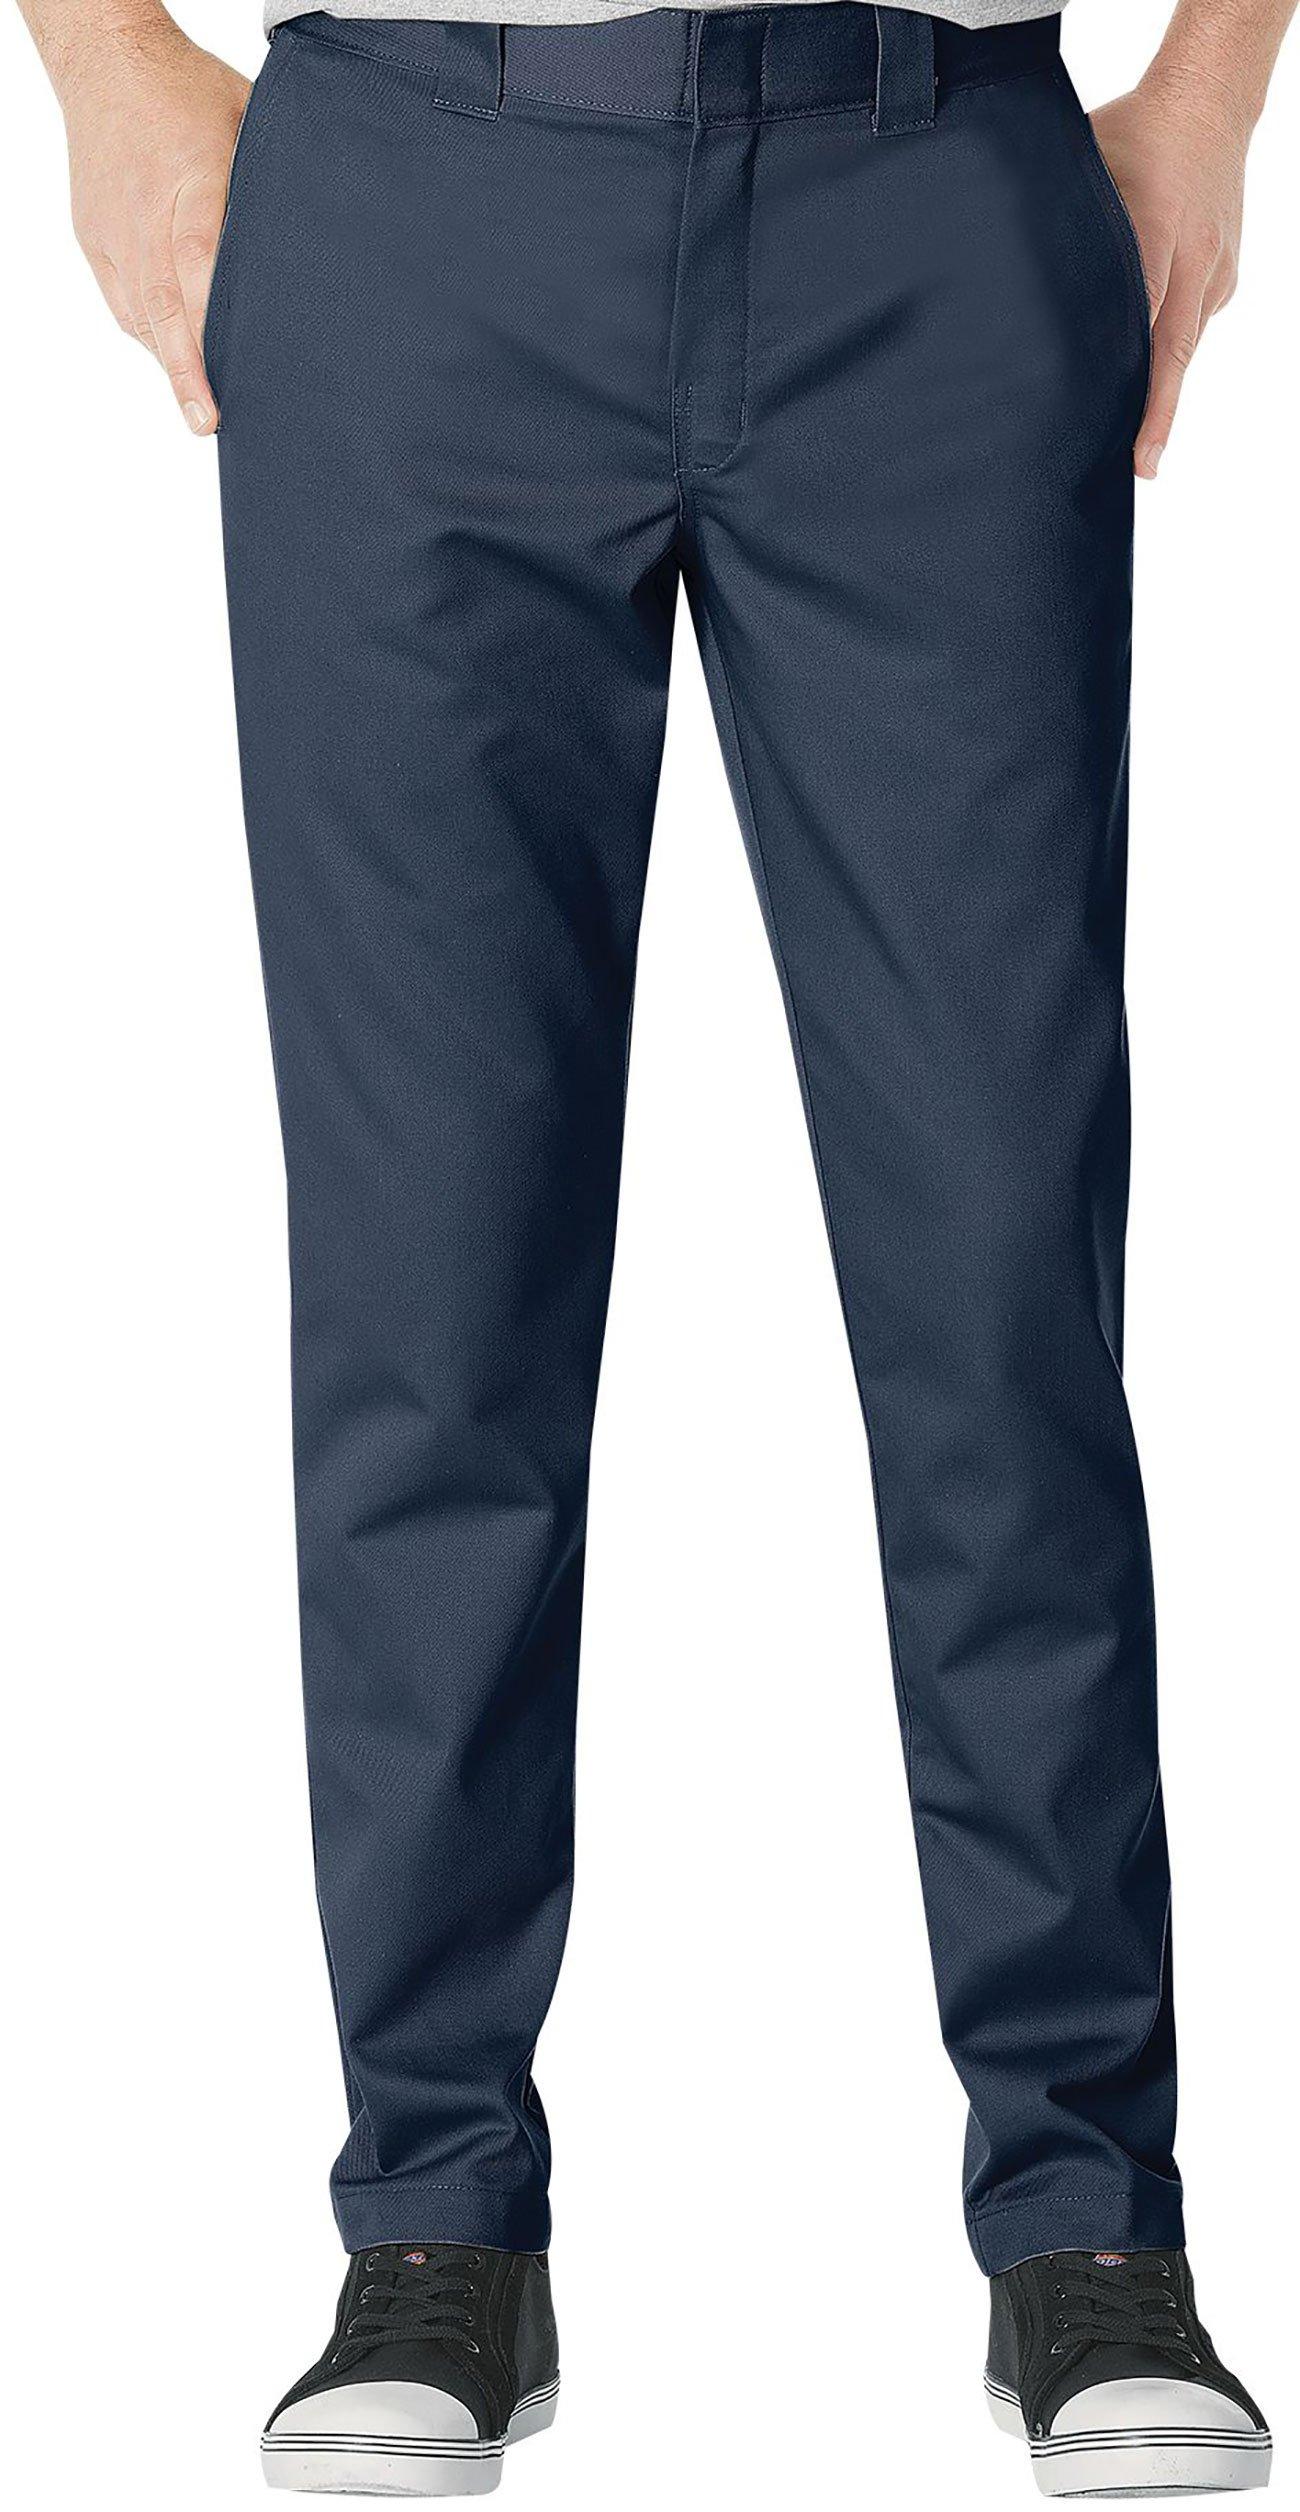 Dickies Mens Slim Fit Tapered Leg Ring Spun Work Pant, Dark Navy, 29W x 30L